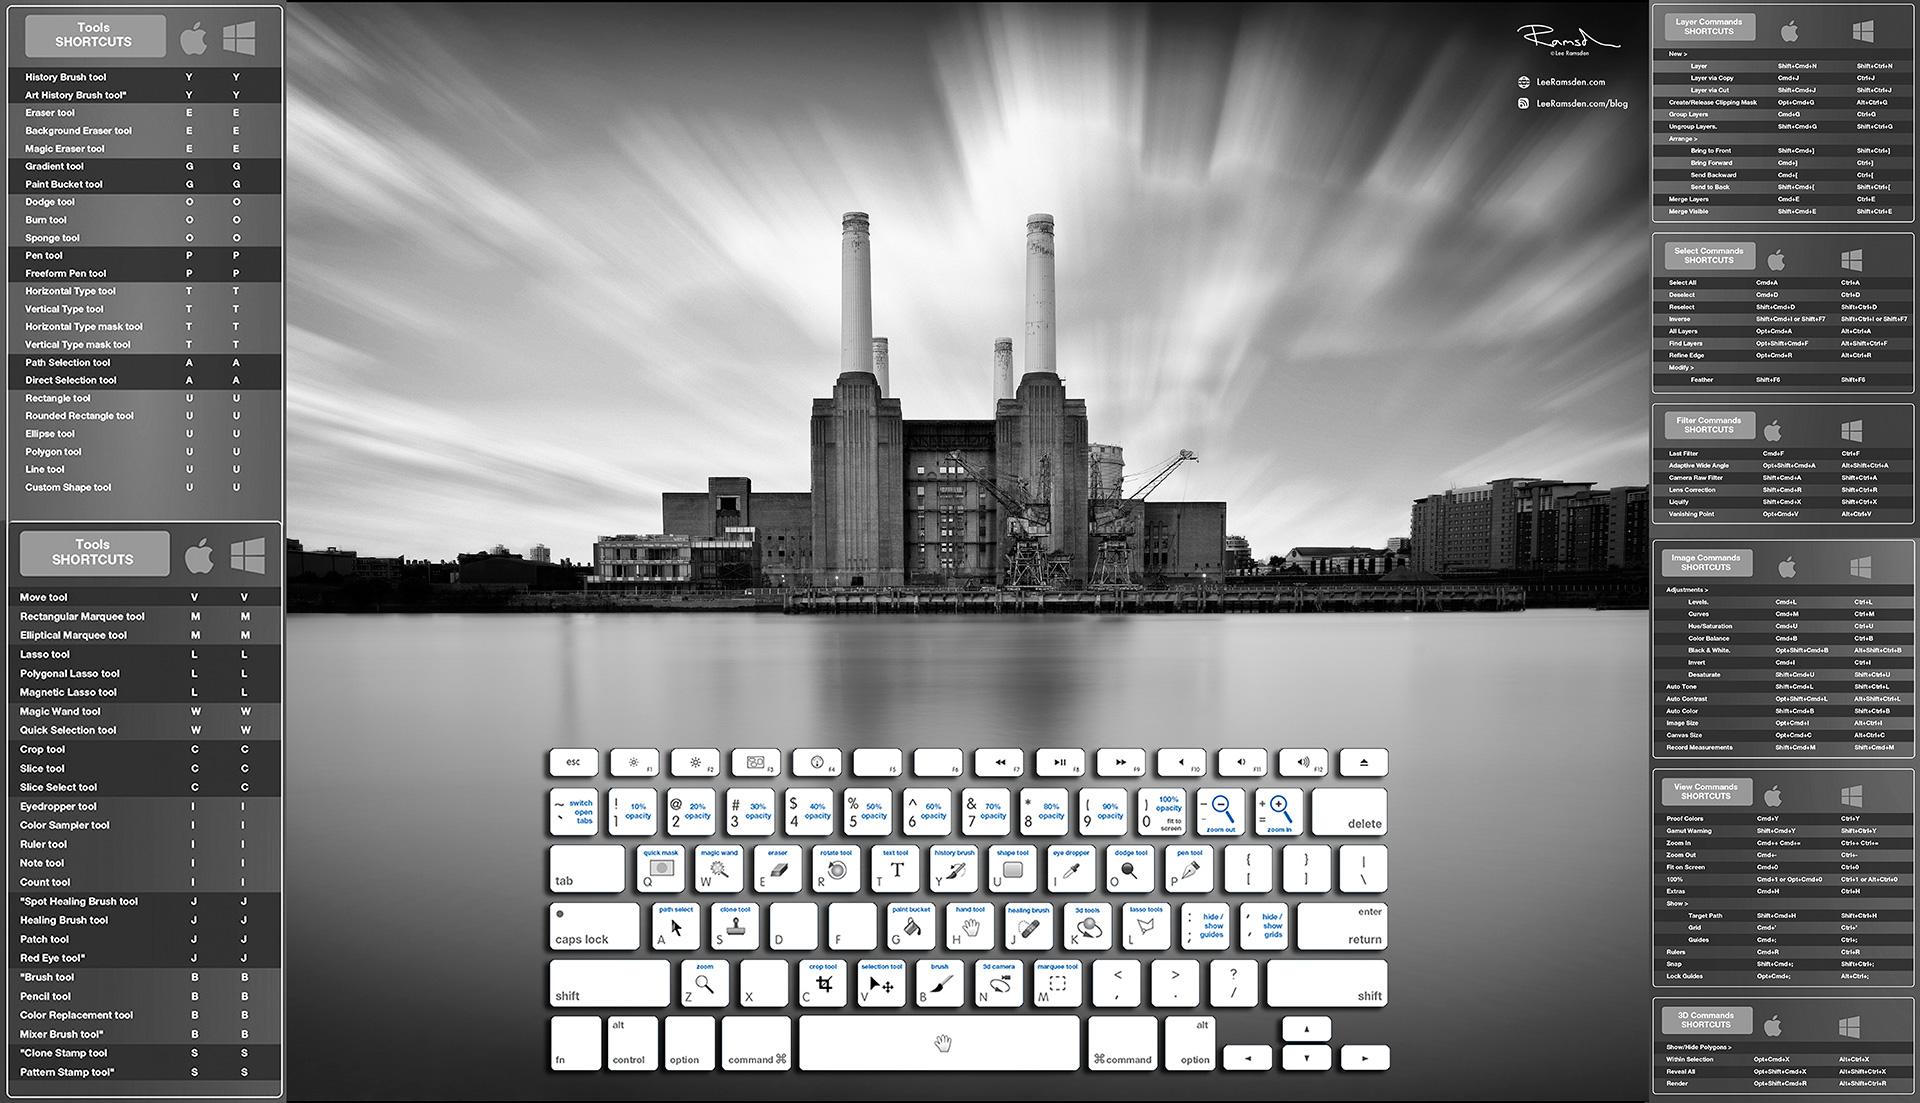 London Battersea power station photoshop short cuts education help tutorial Lee Ramsden